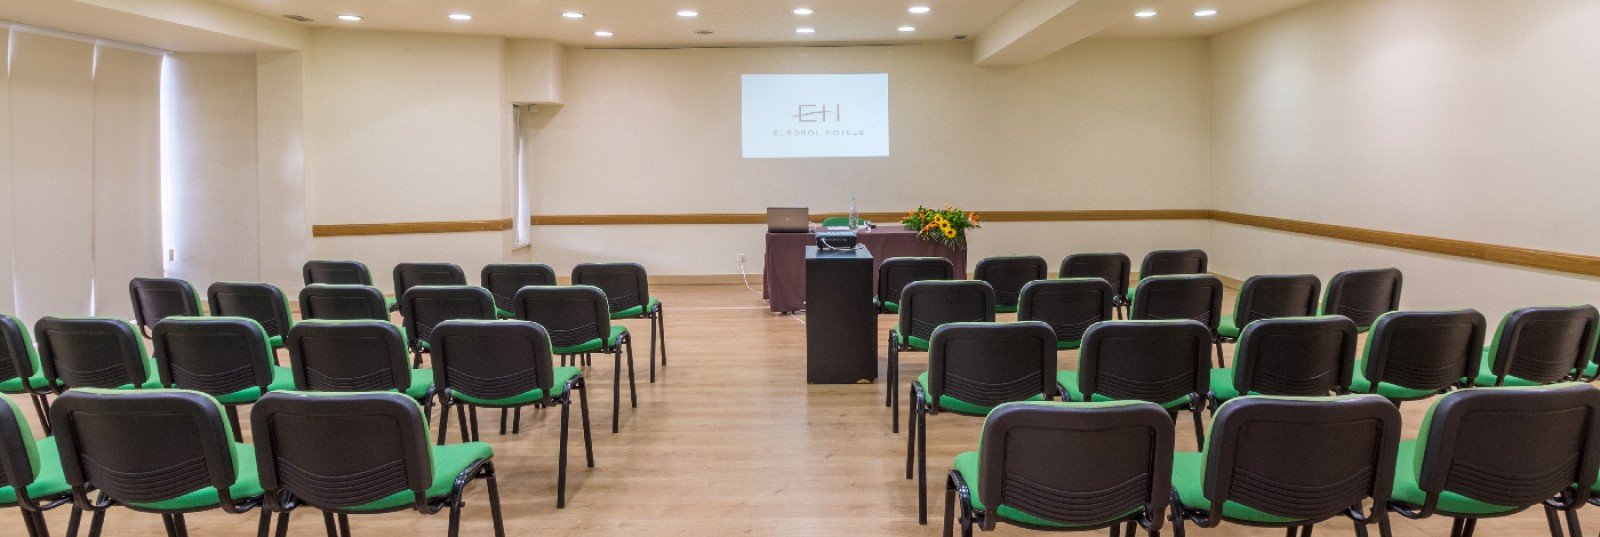 Hotel Eurosol Leiria sala reuniões